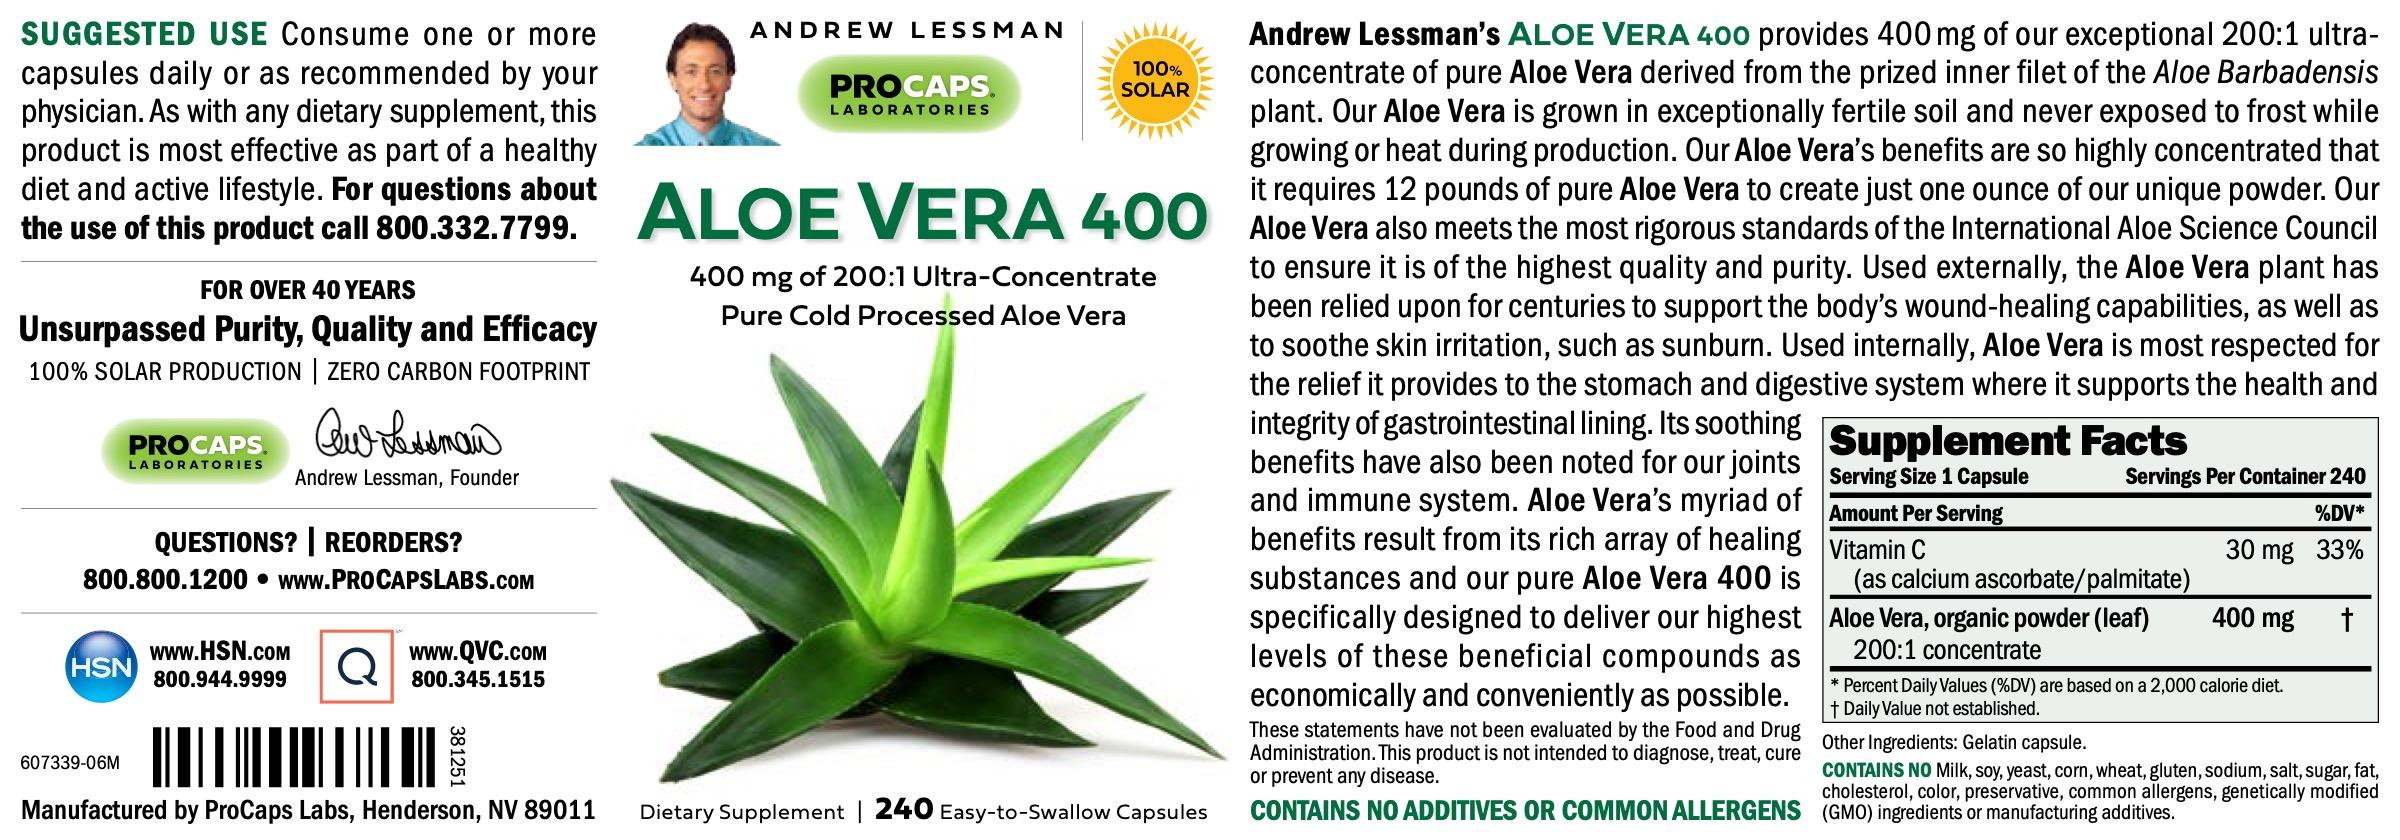 Aloe-Vera-400-Capsules-Digestive-Support